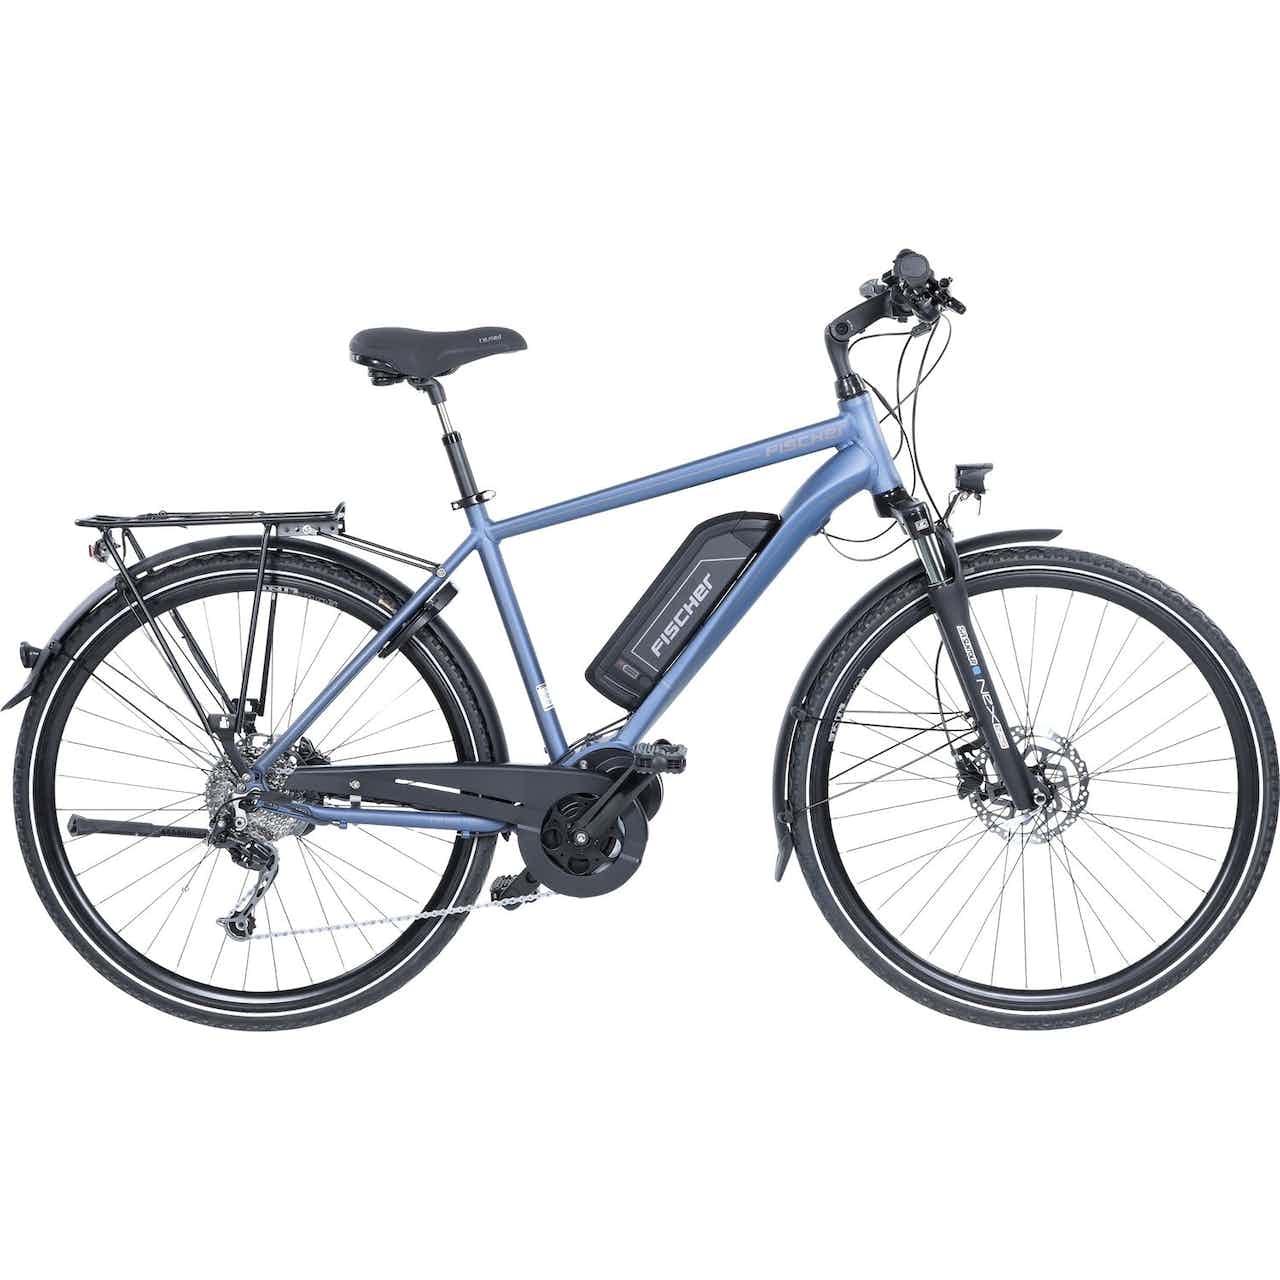 "Fischer E-Bike Herren Trekking-Fahrrad 28"" ETH 1820-S1"